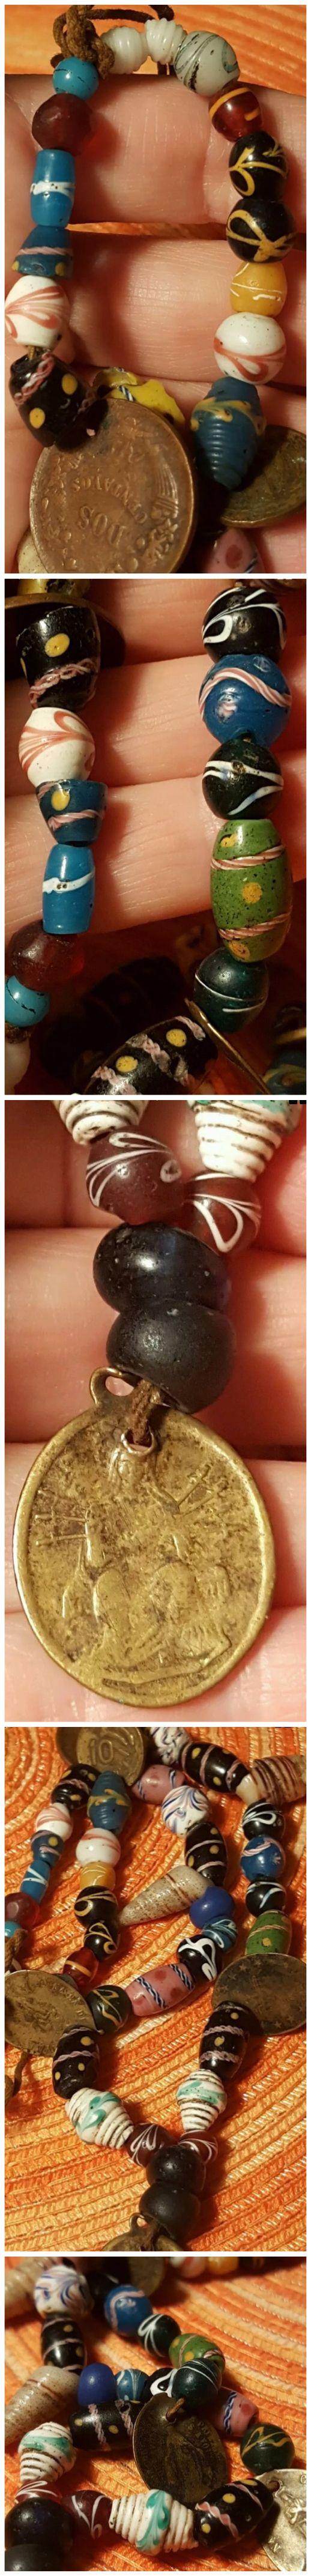 Antique Venetian trade beads from Peru.